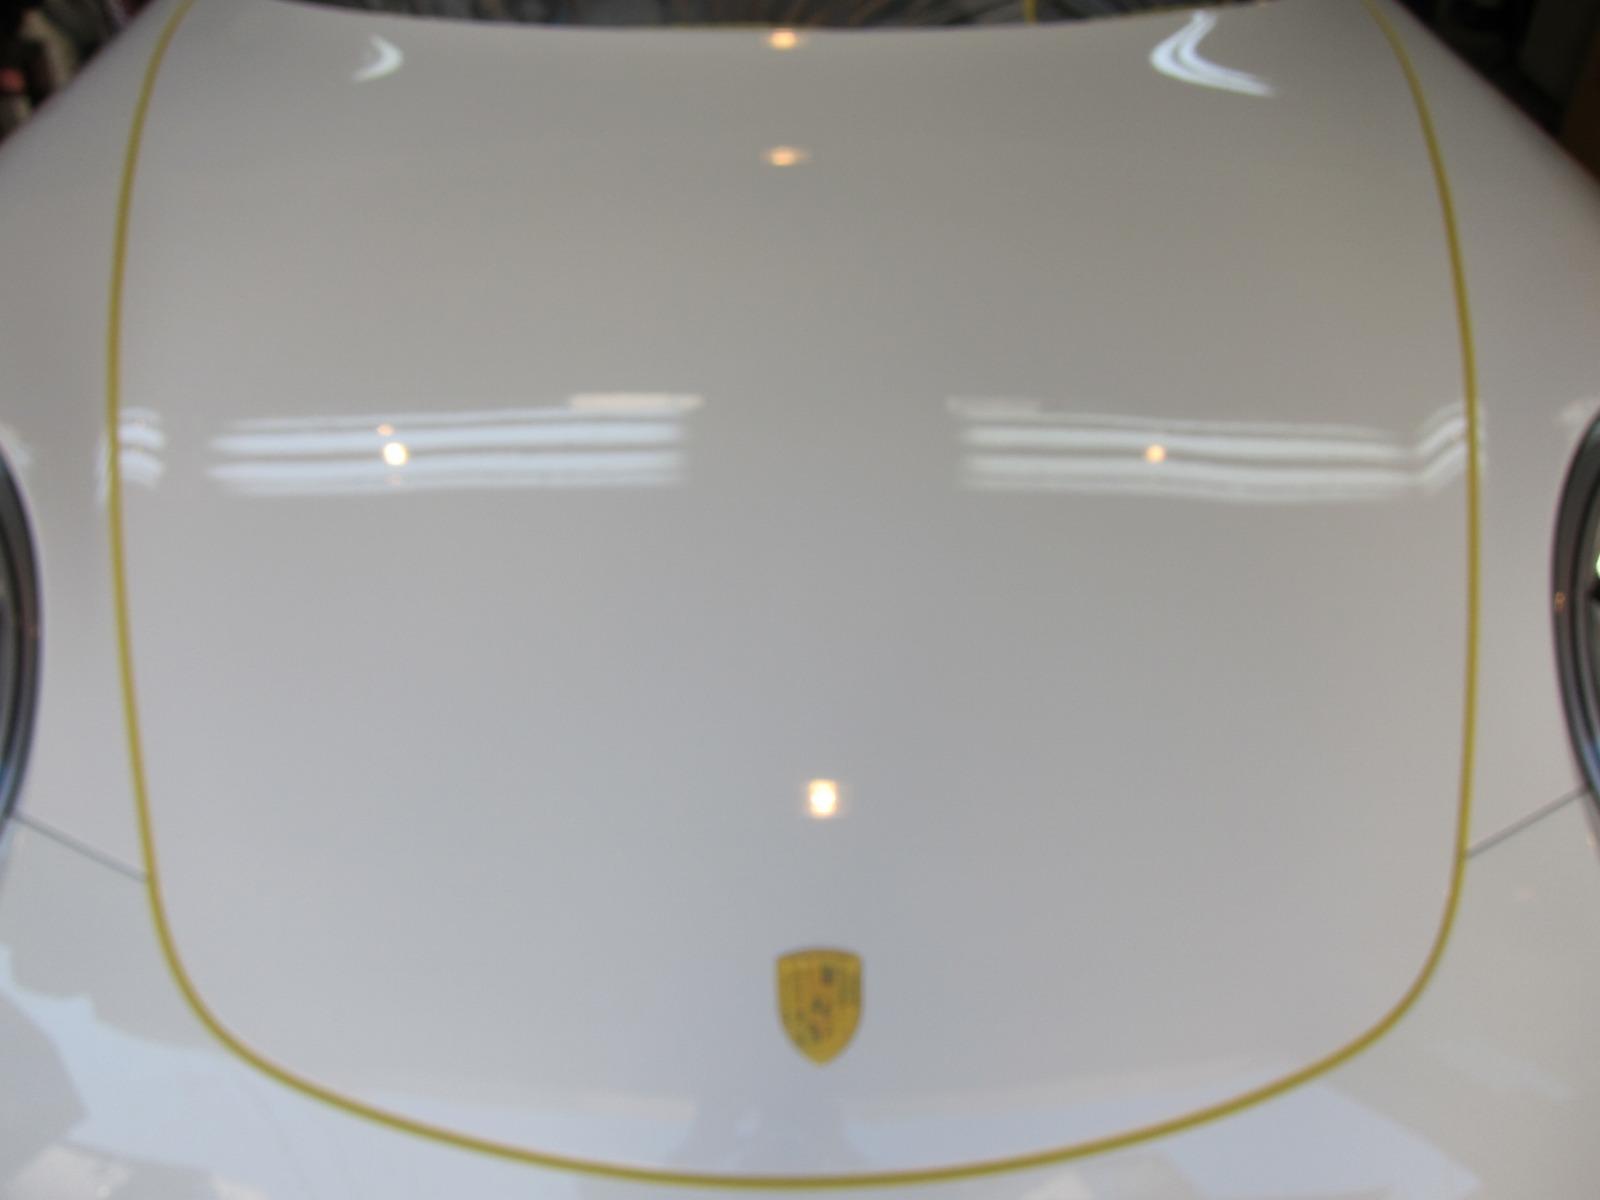 20150213-porsche-911-carrera4-10